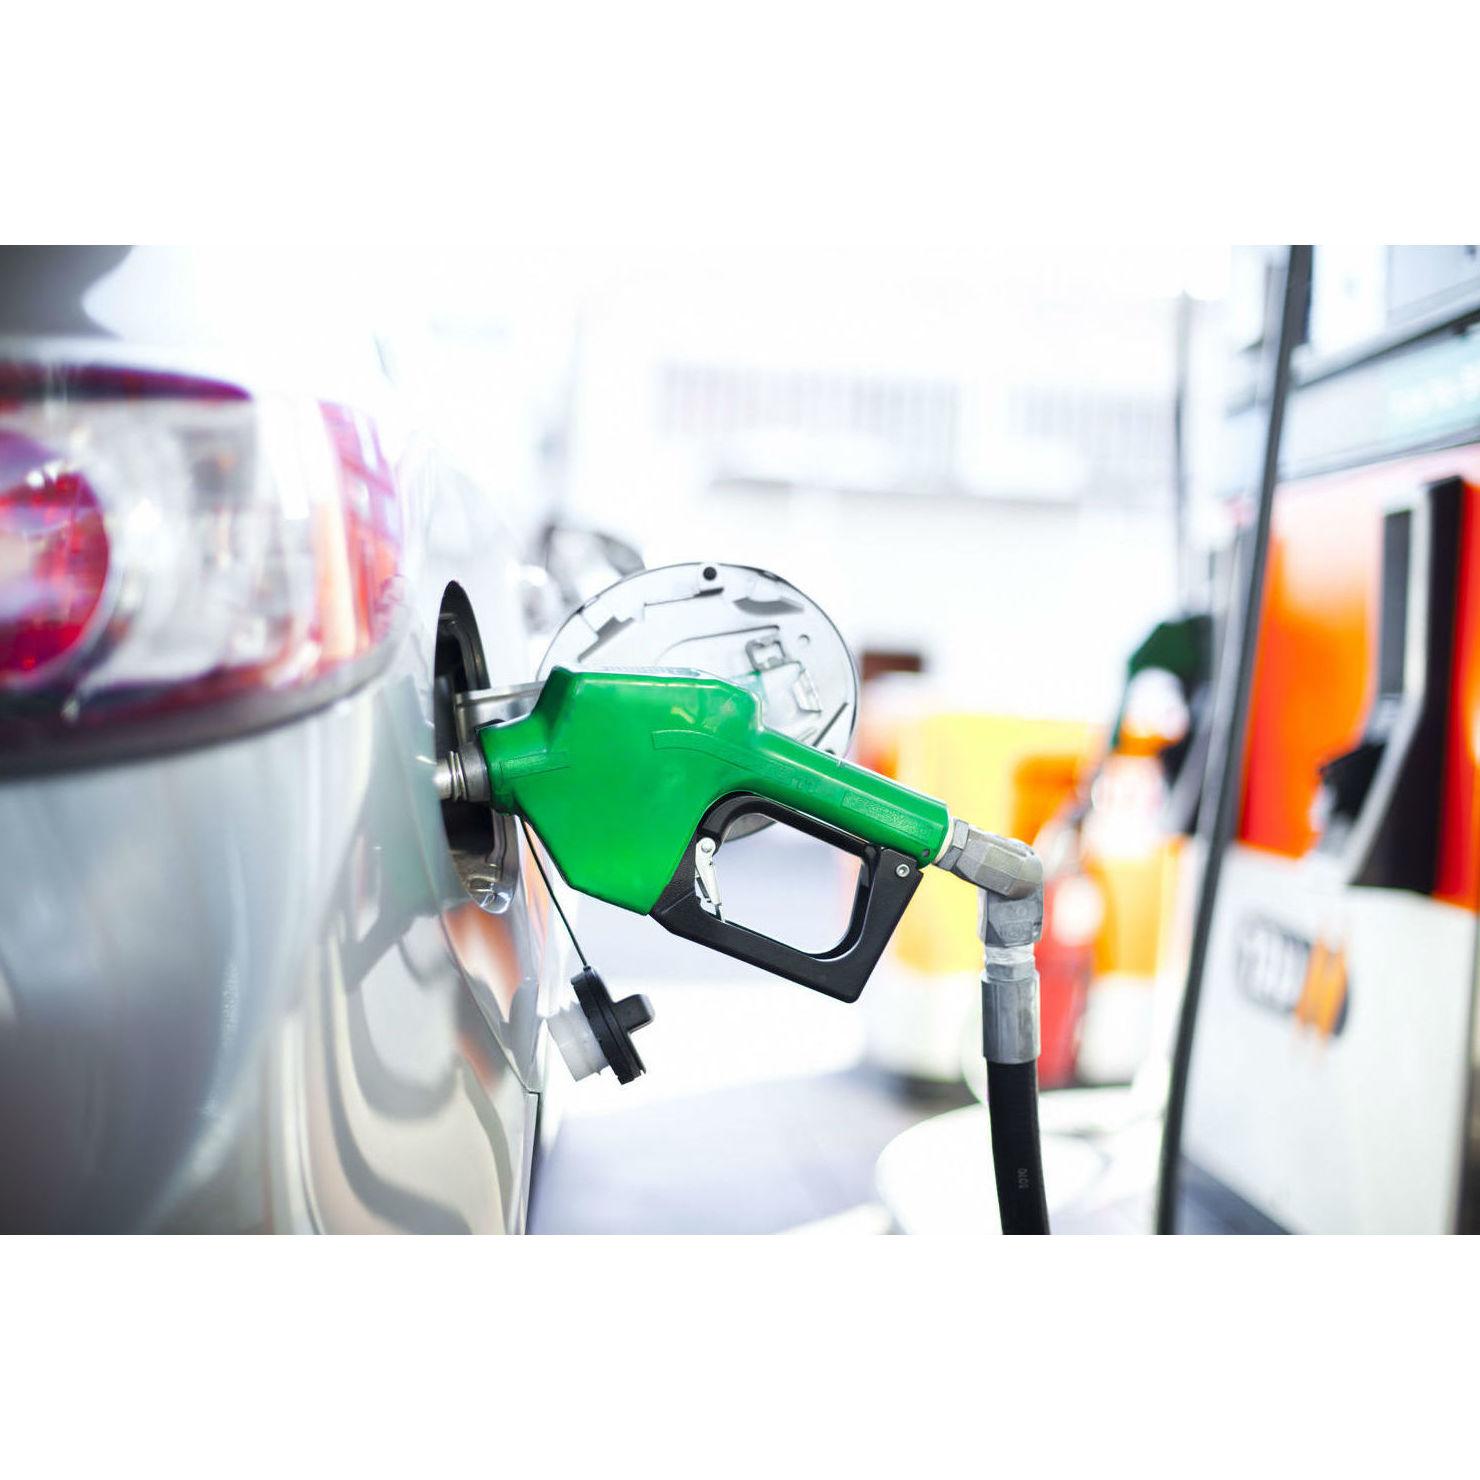 Venta de combustible: Servicios de Carmelo Talavera e hijos, S. L.